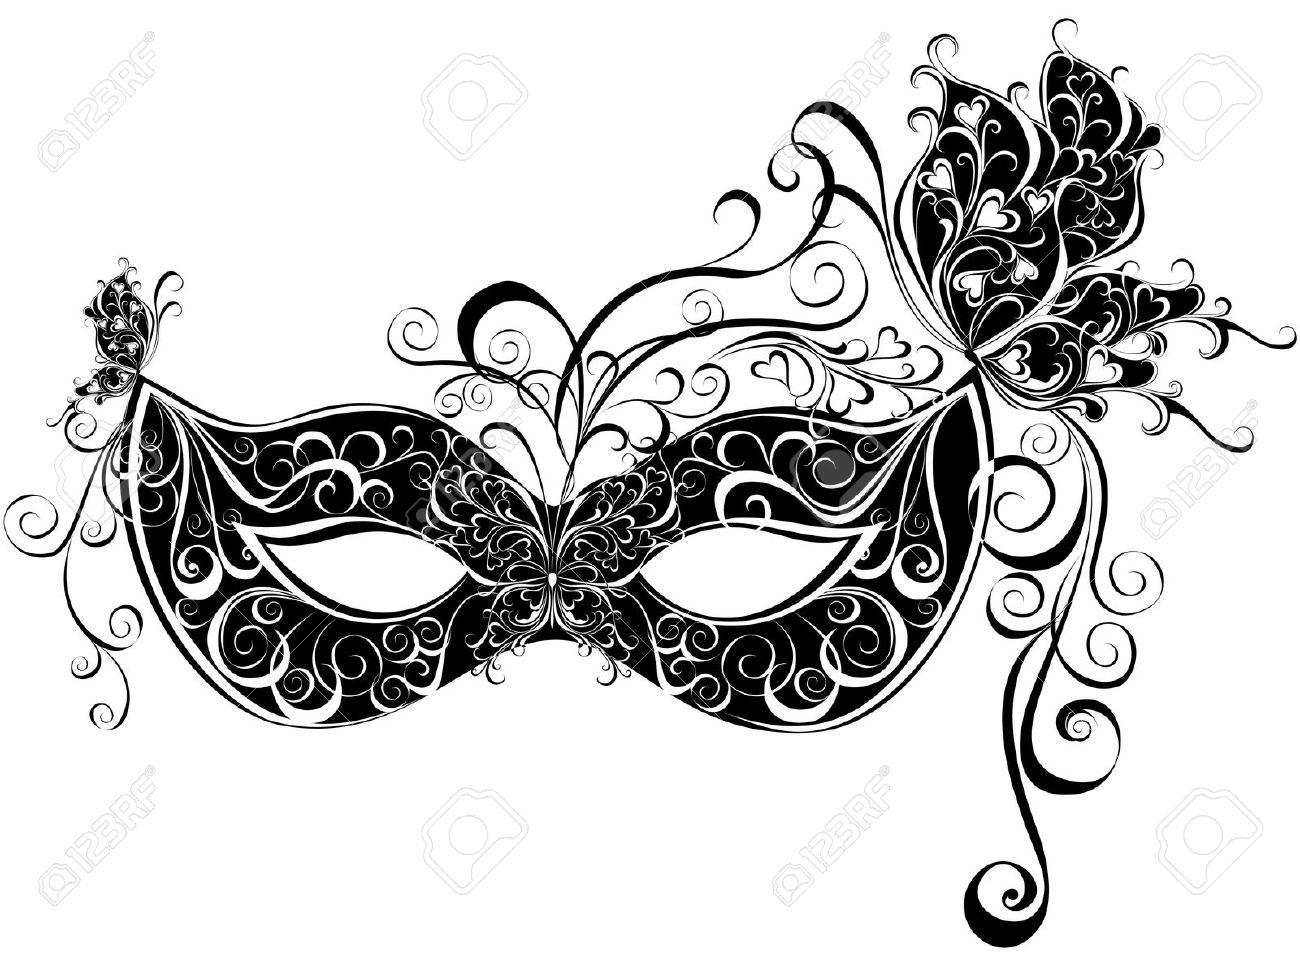 hight resolution of masquerade mask carnival mas masquerade mask clipart